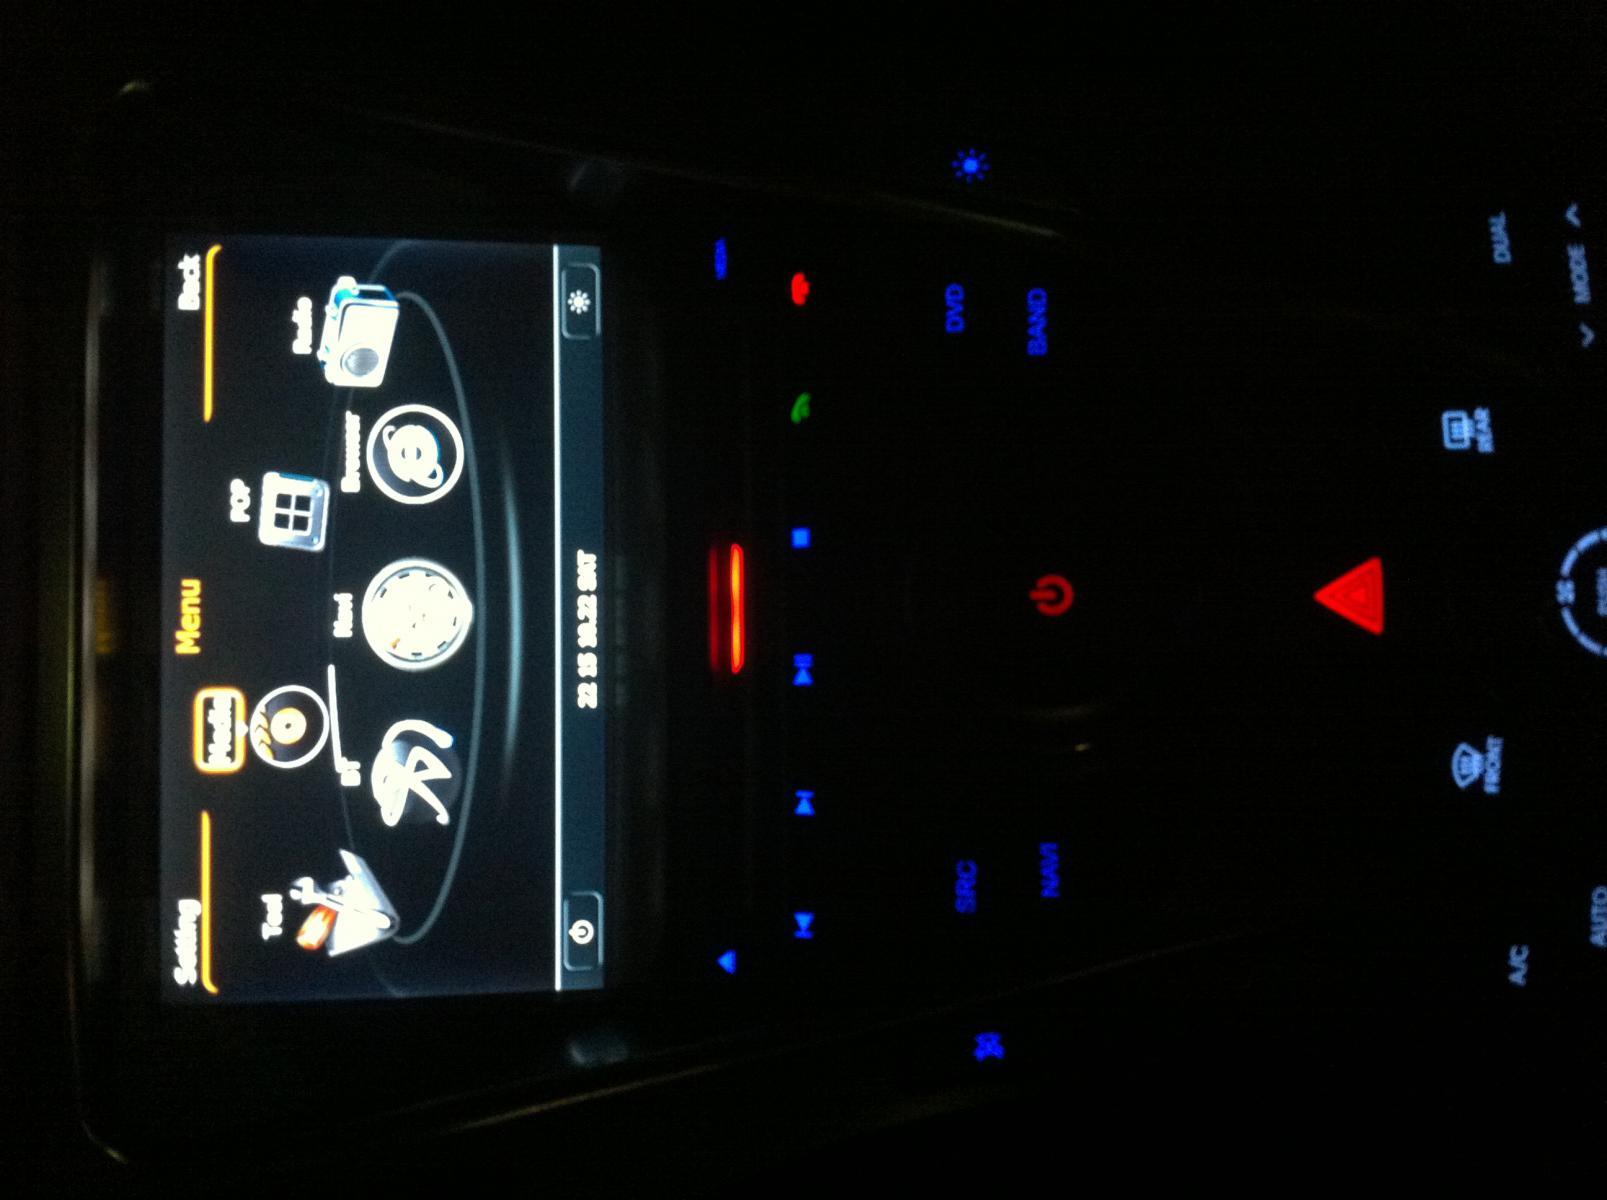 Missing azera 2013 beep sound's and alarms   Hyundai Forums